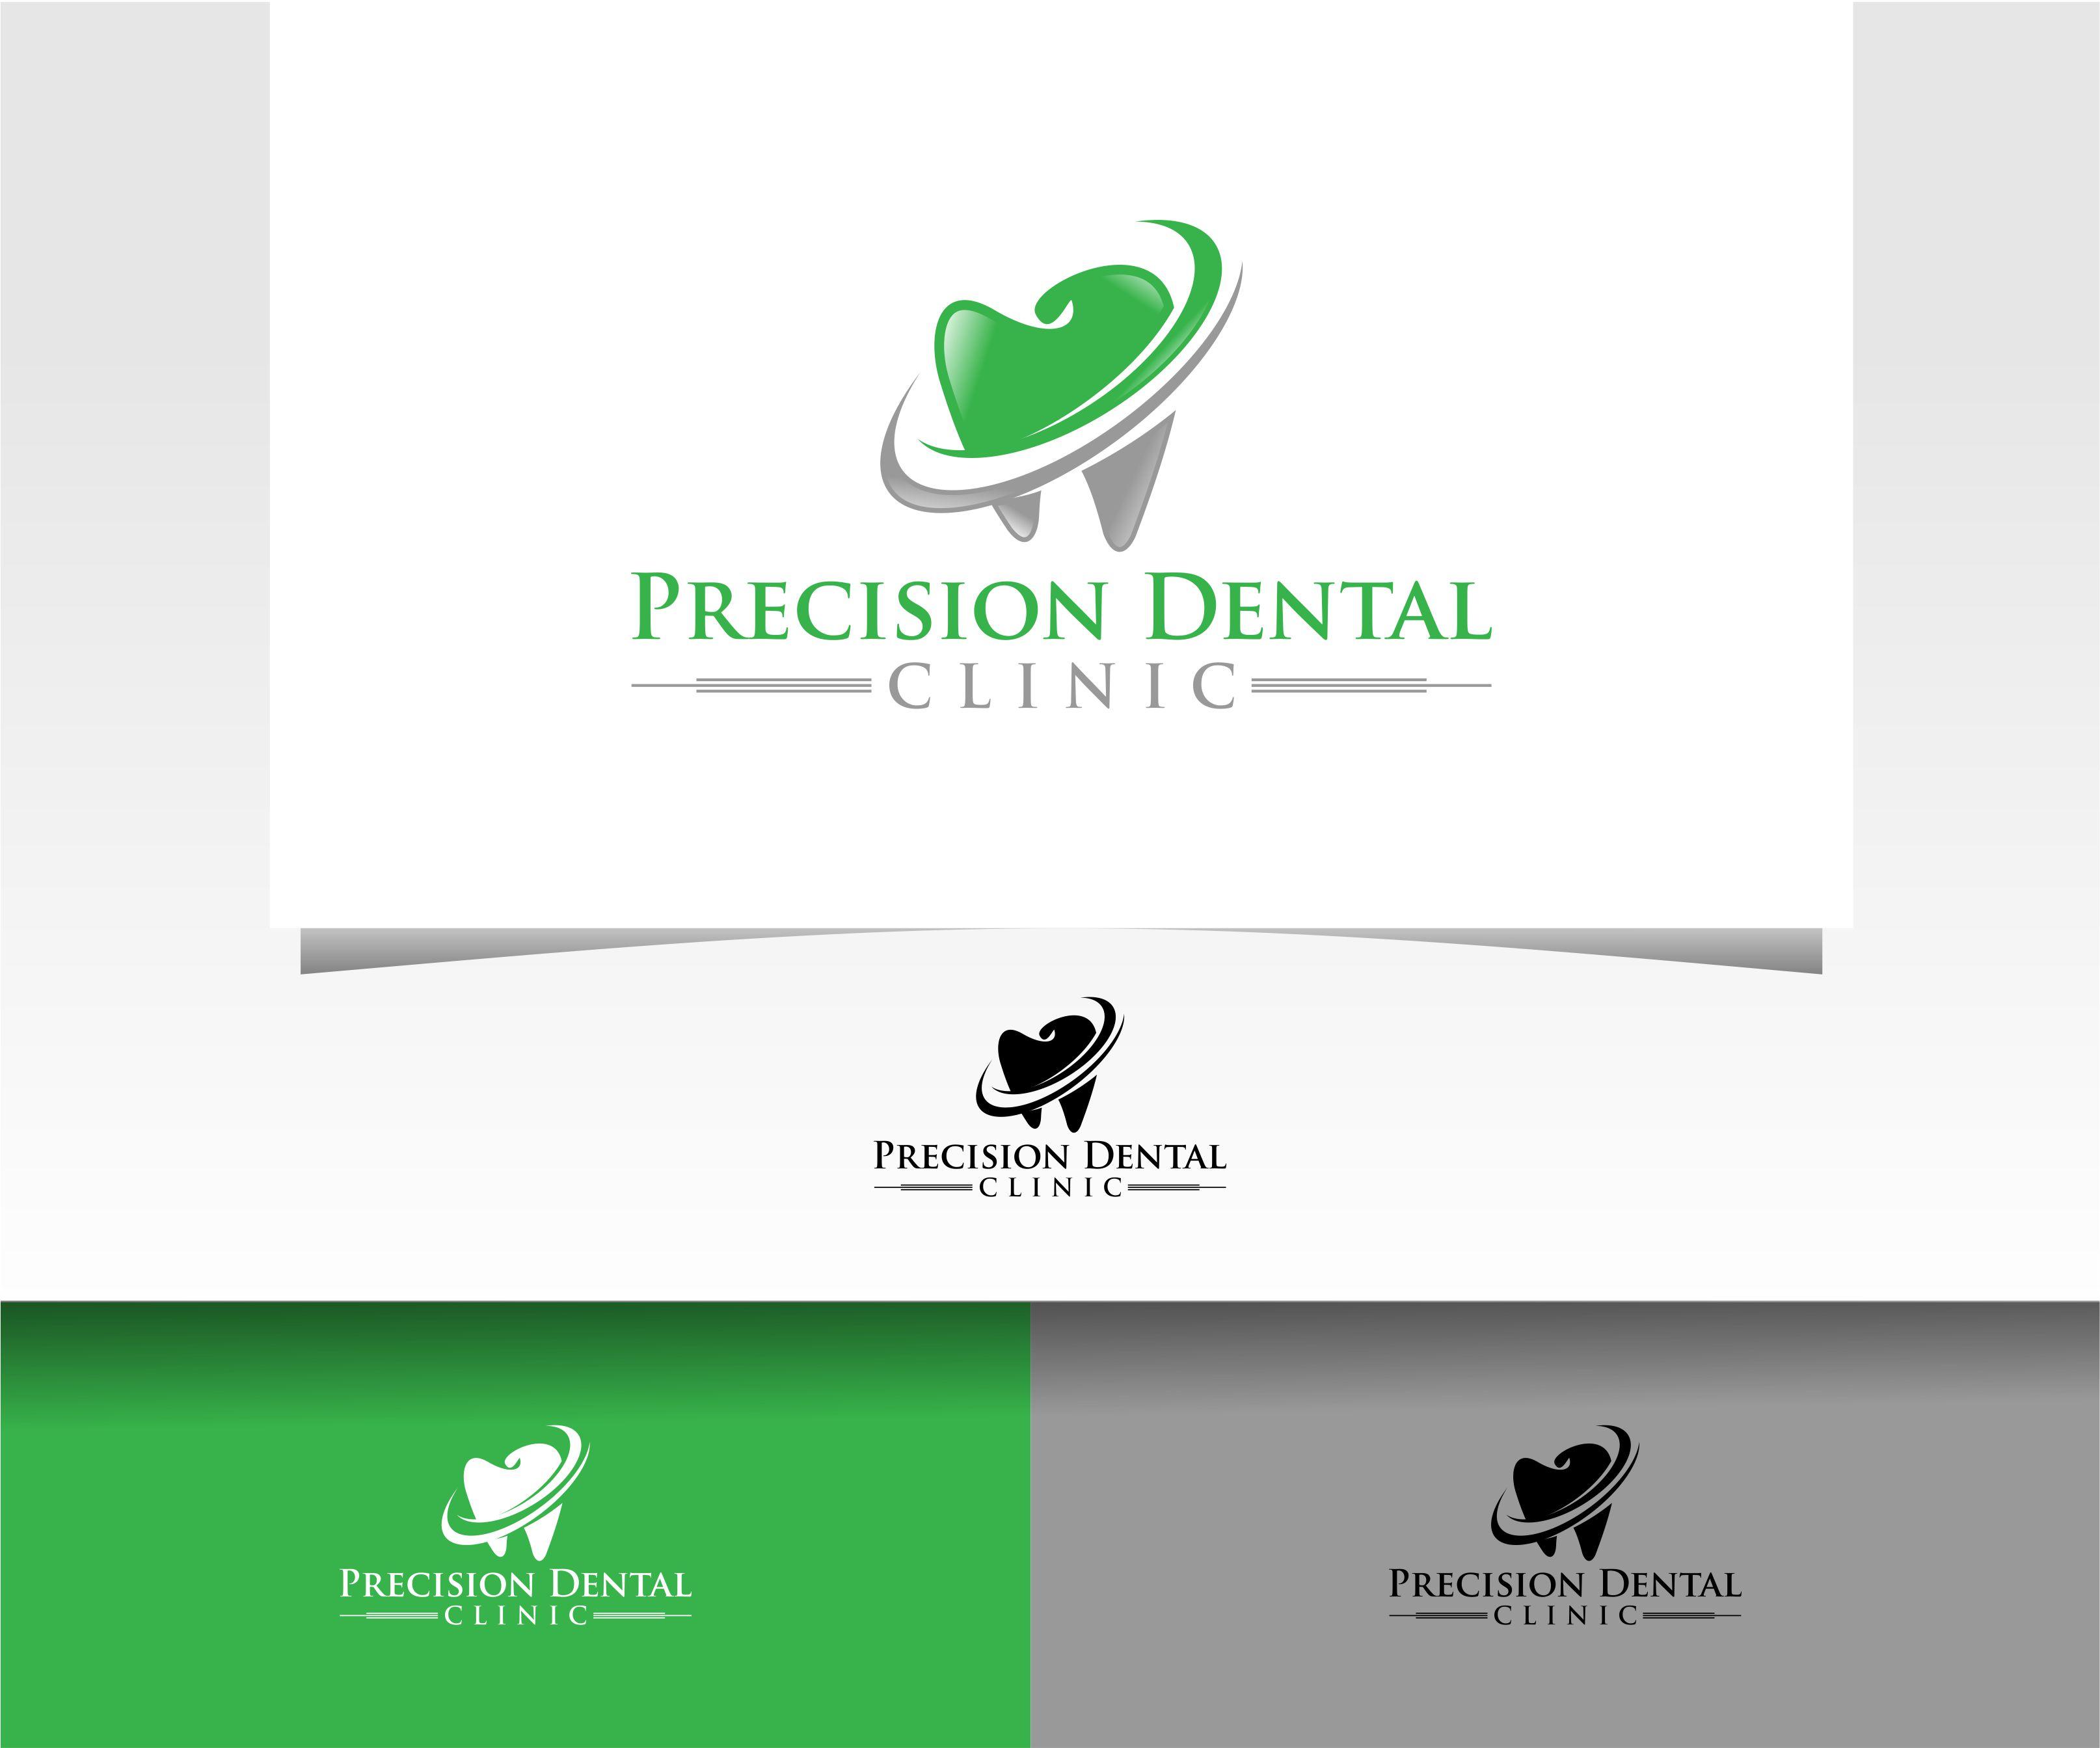 Logo Design by Raymond Garcia - Entry No. 57 in the Logo Design Contest Captivating Logo Design for Precision Dental Clinic.